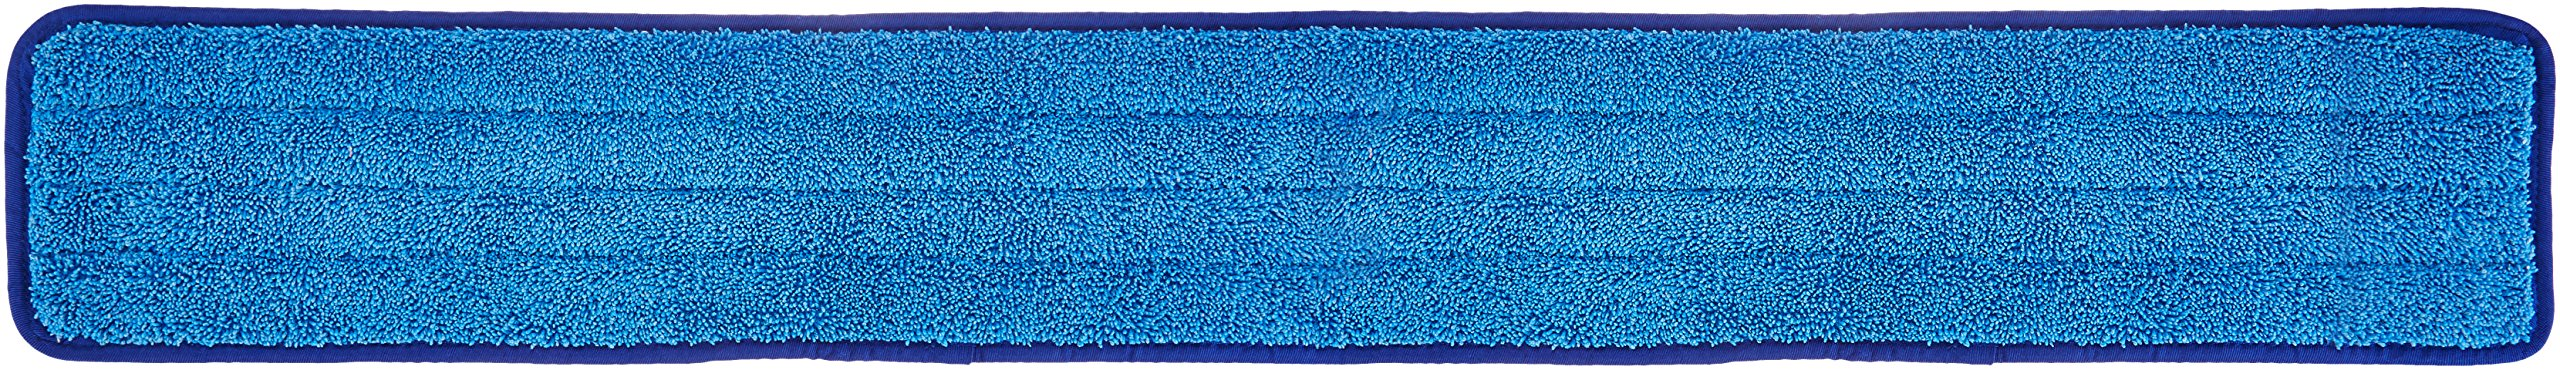 AmazonBasics Microfiber Damp Mop Cleaning Pad, Plain, 36 Inch, 12-Pack by AmazonBasics